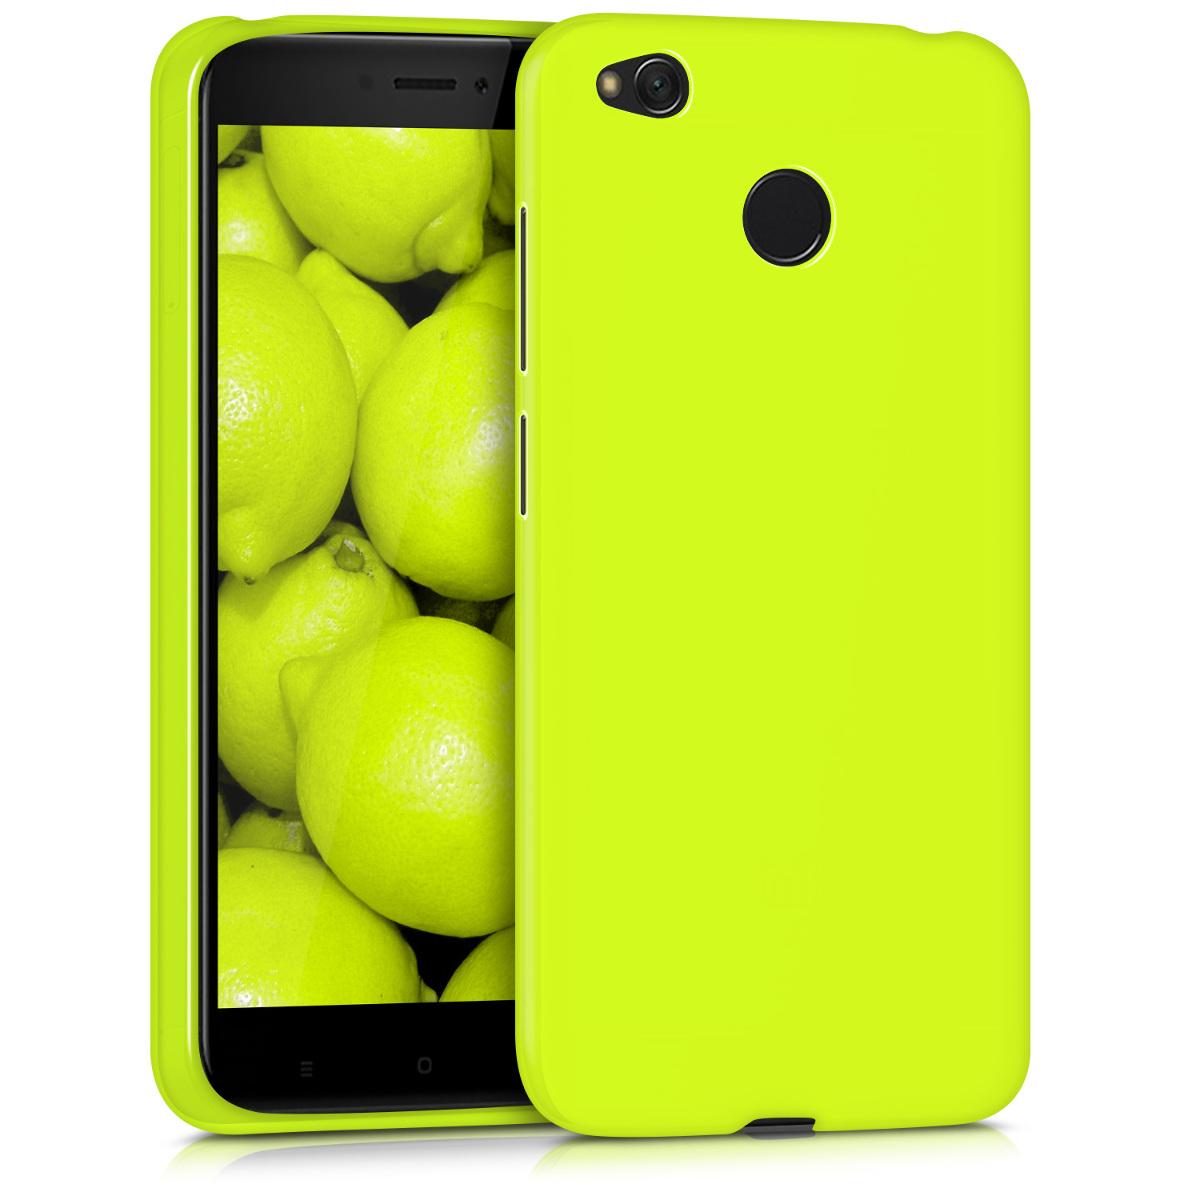 Kvalitní silikonové TPU pouzdro | obal pro Xiaomi Redmi 4X - Neon žluté